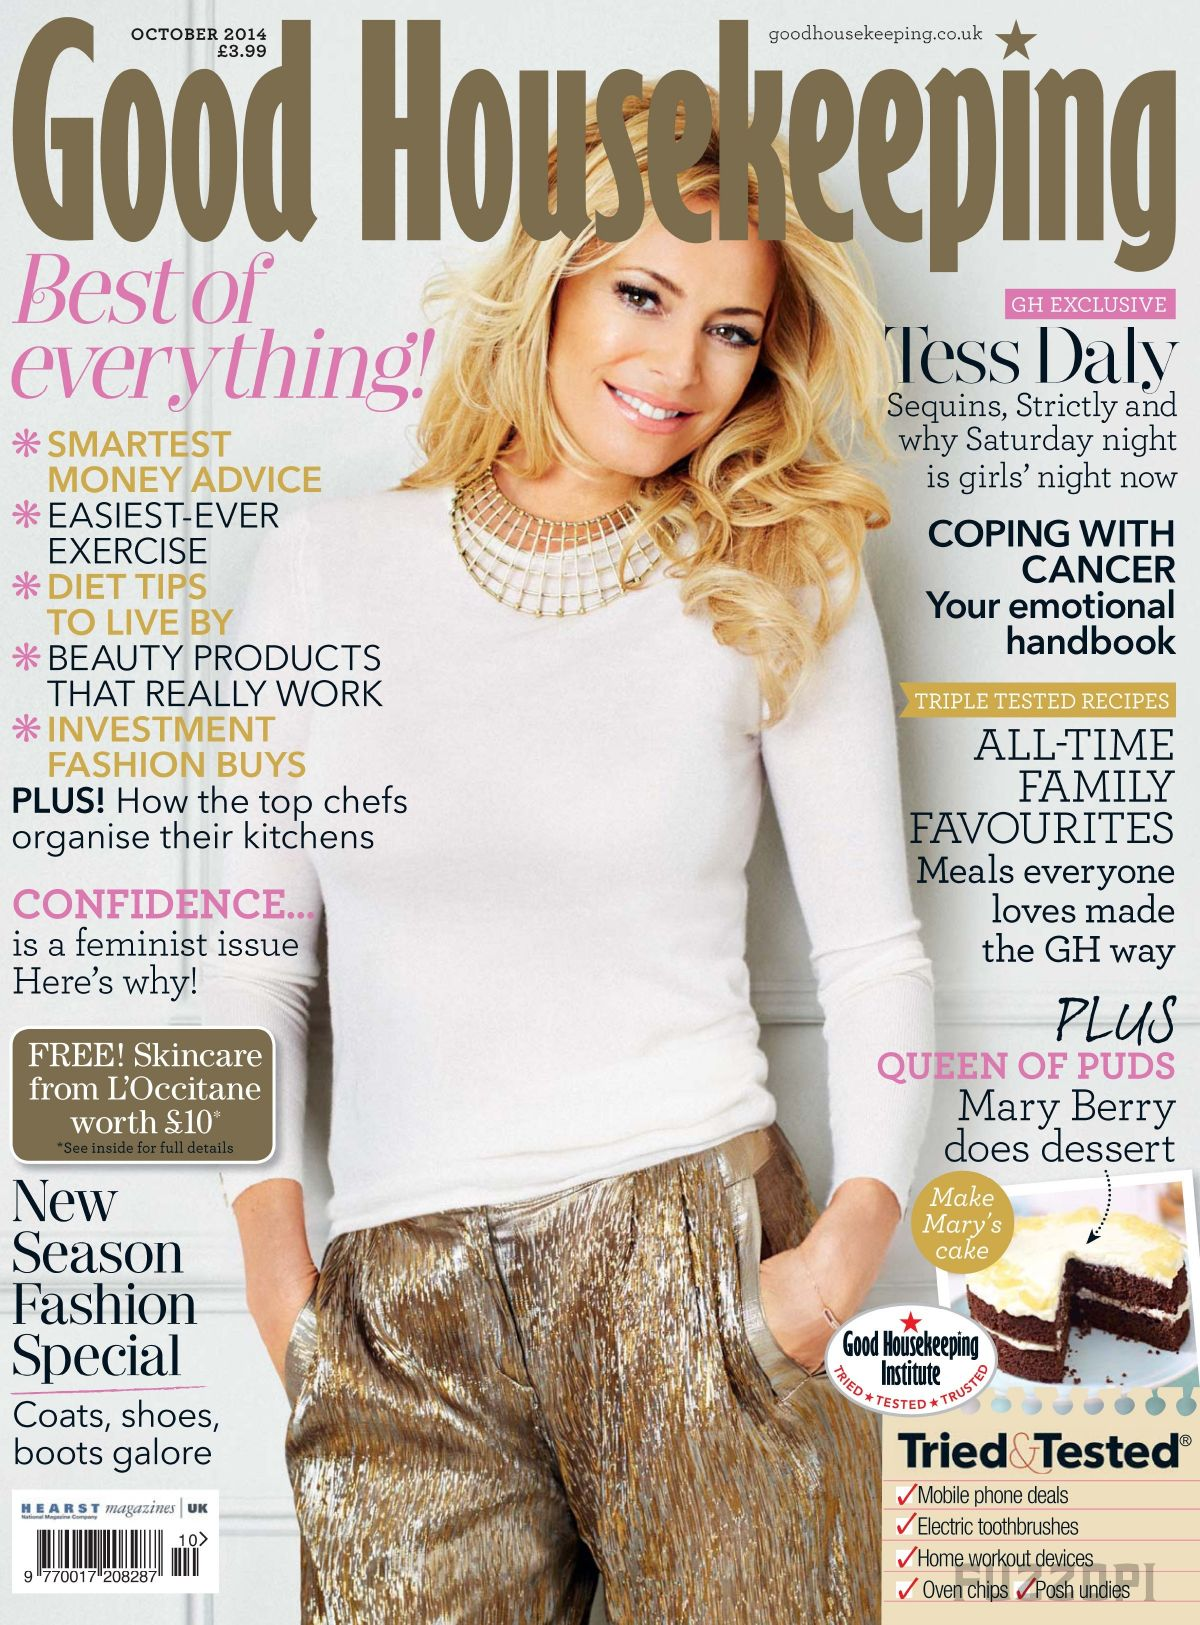 good housekeeping magazine: